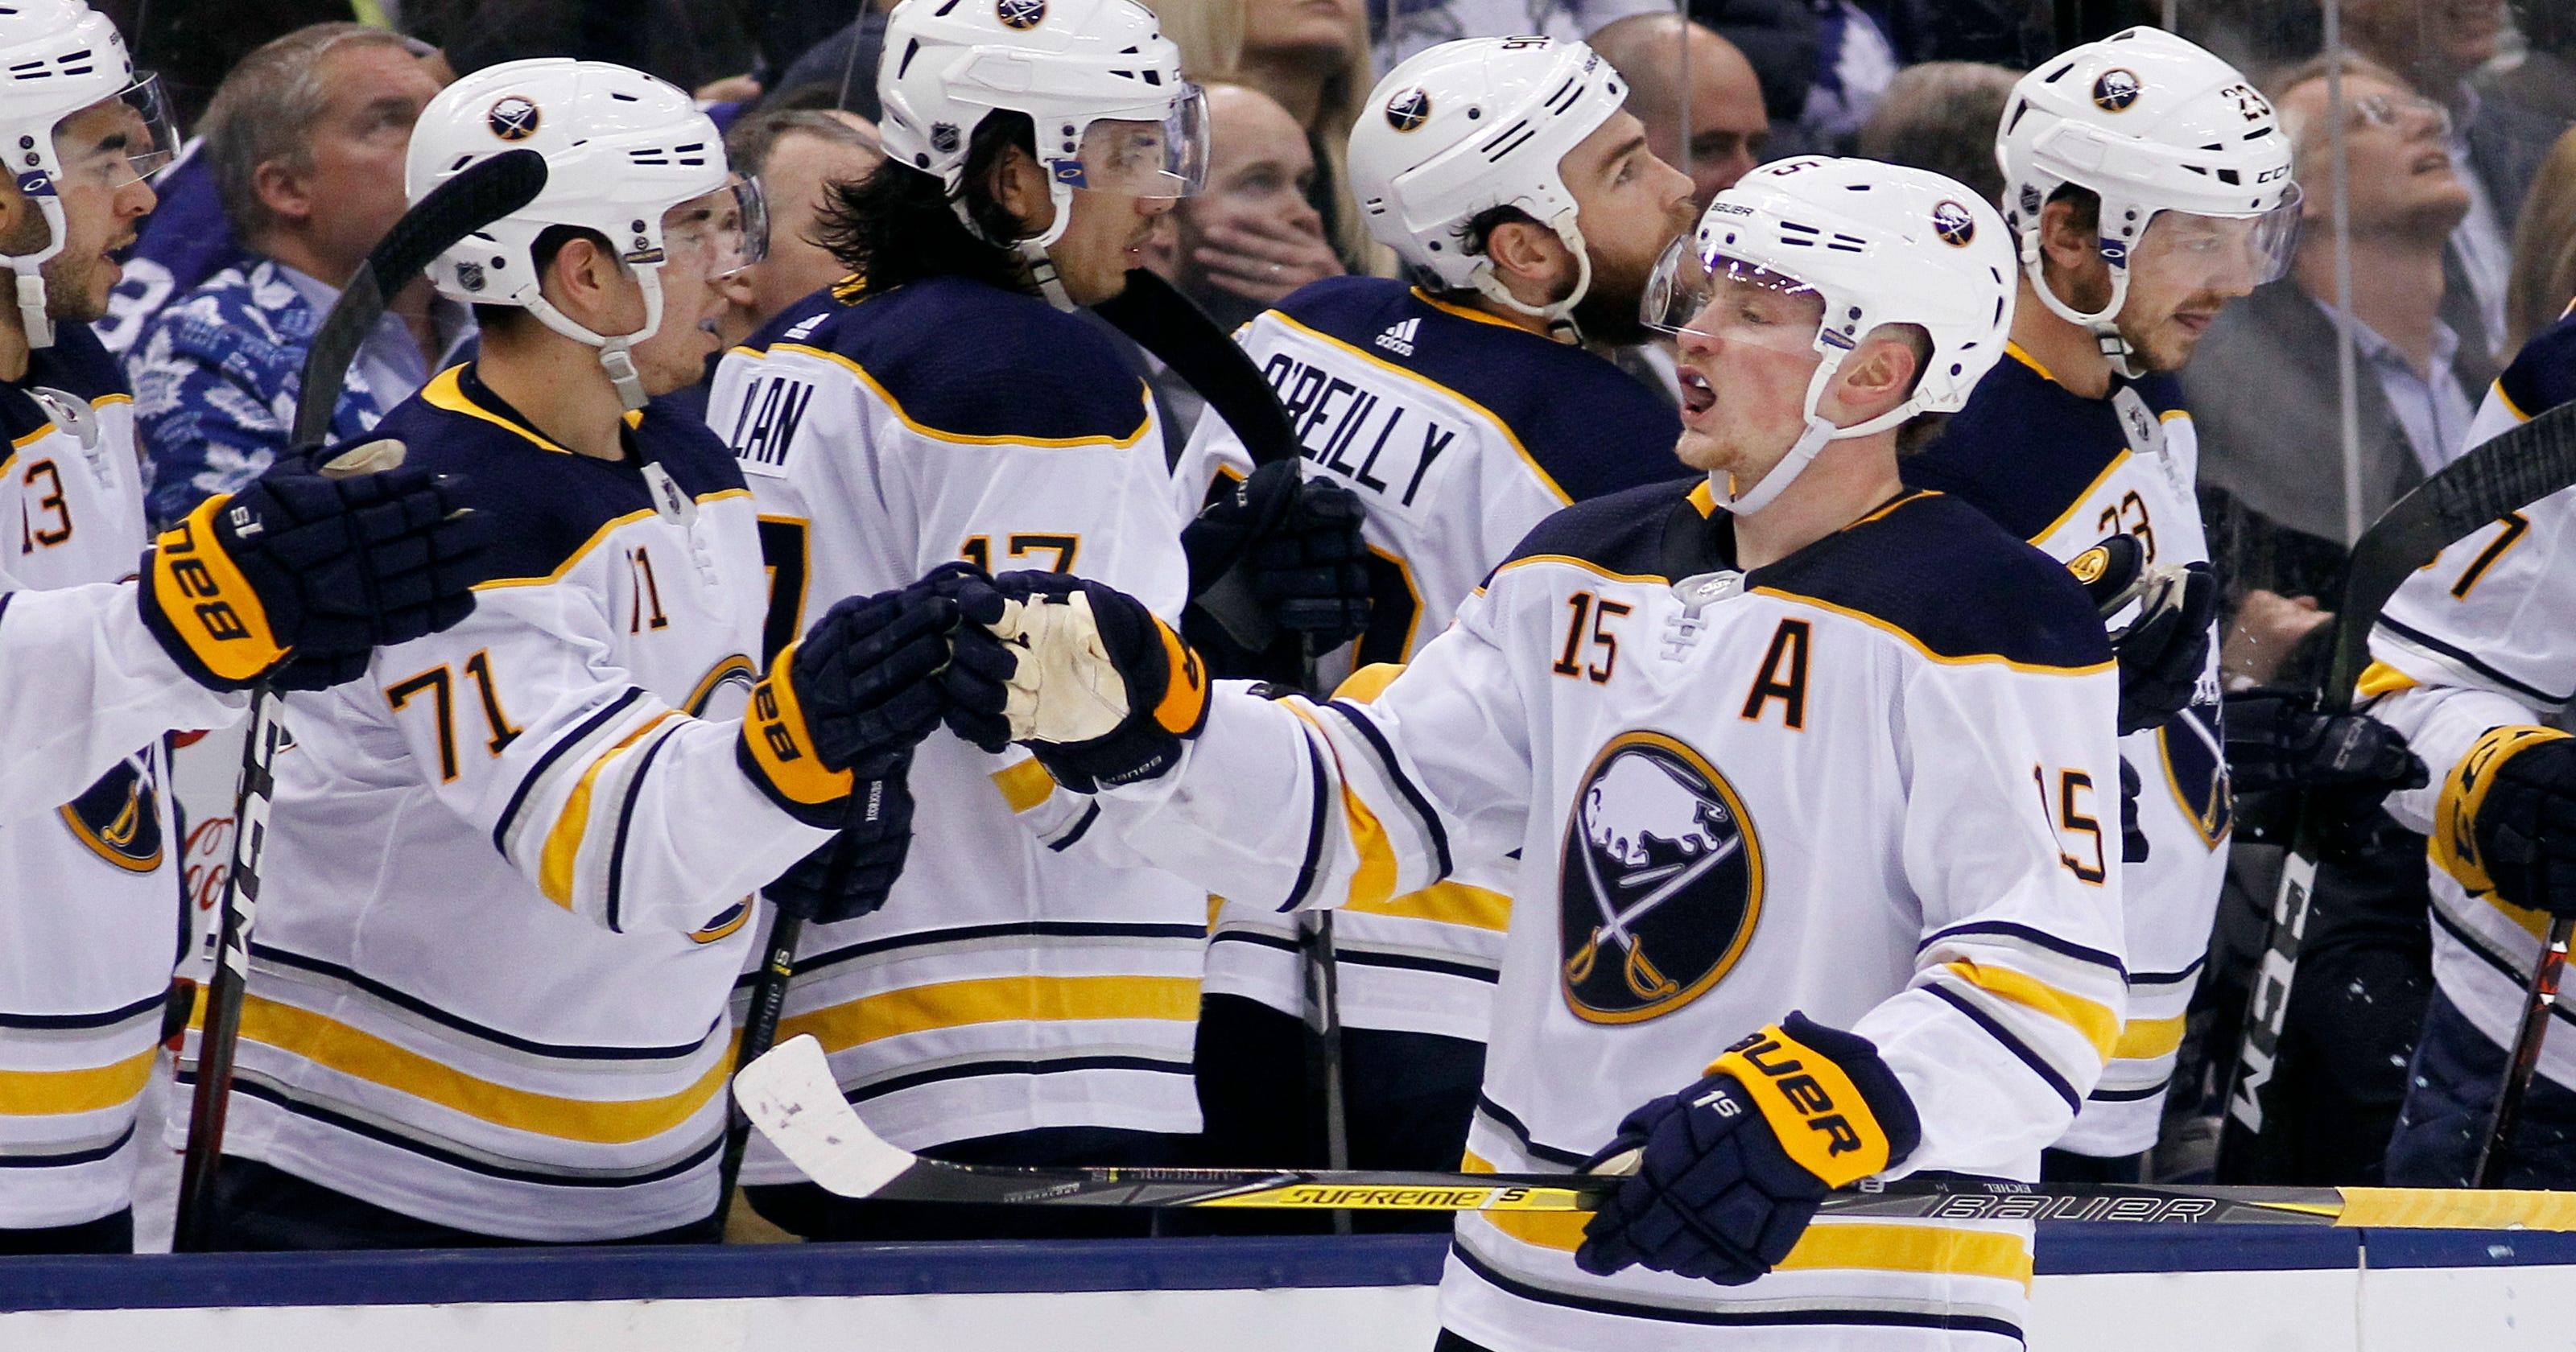 955df0ed6 Buffalo Sabres end Toronto Maple Leafs  club-record 13-game home win streak